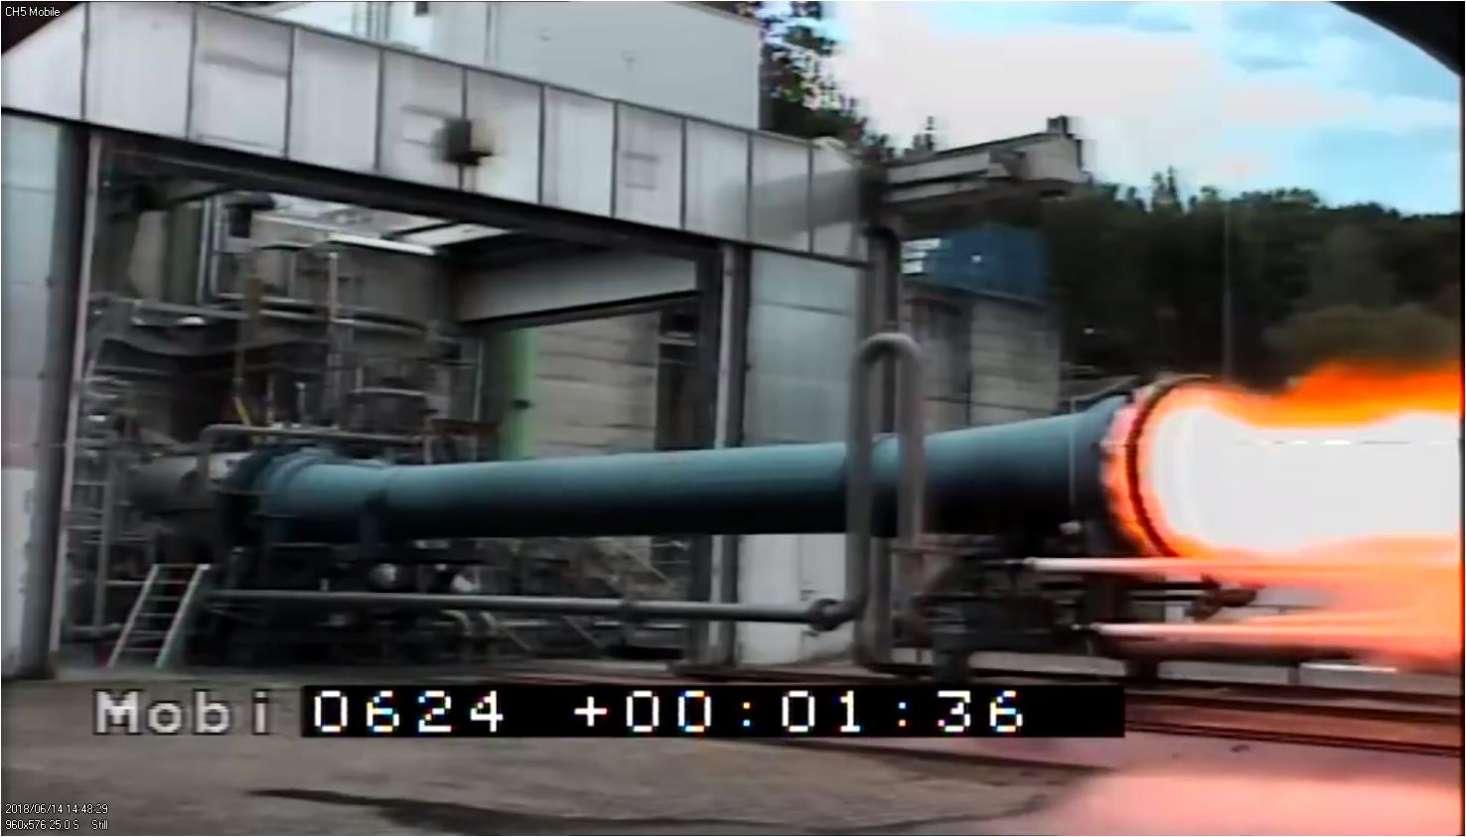 ArianeGroup tests future engine demonstrator